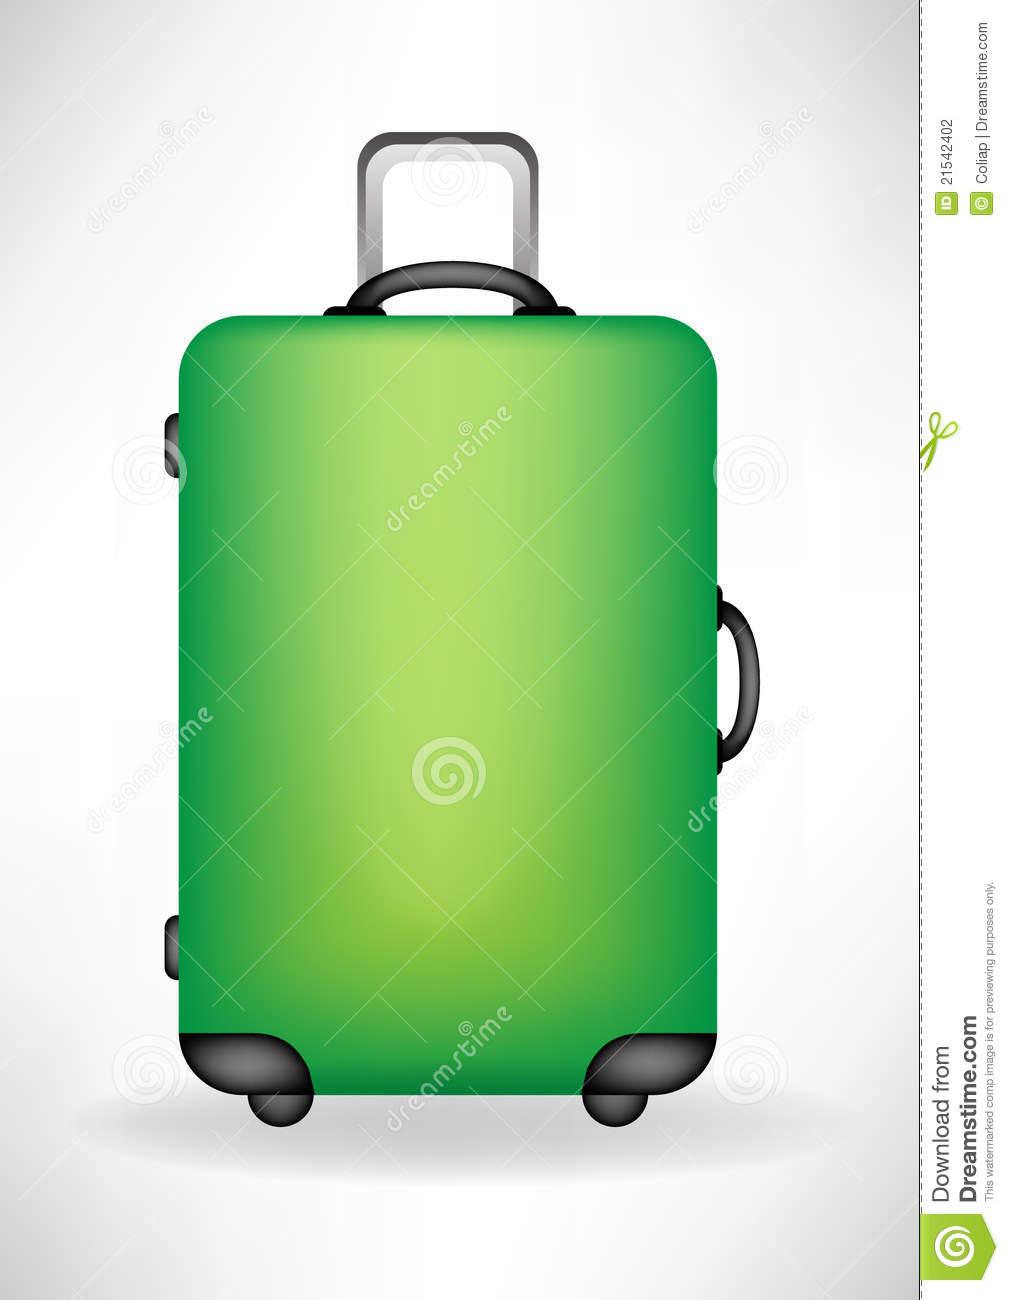 Travel Suitcase Clip Art.